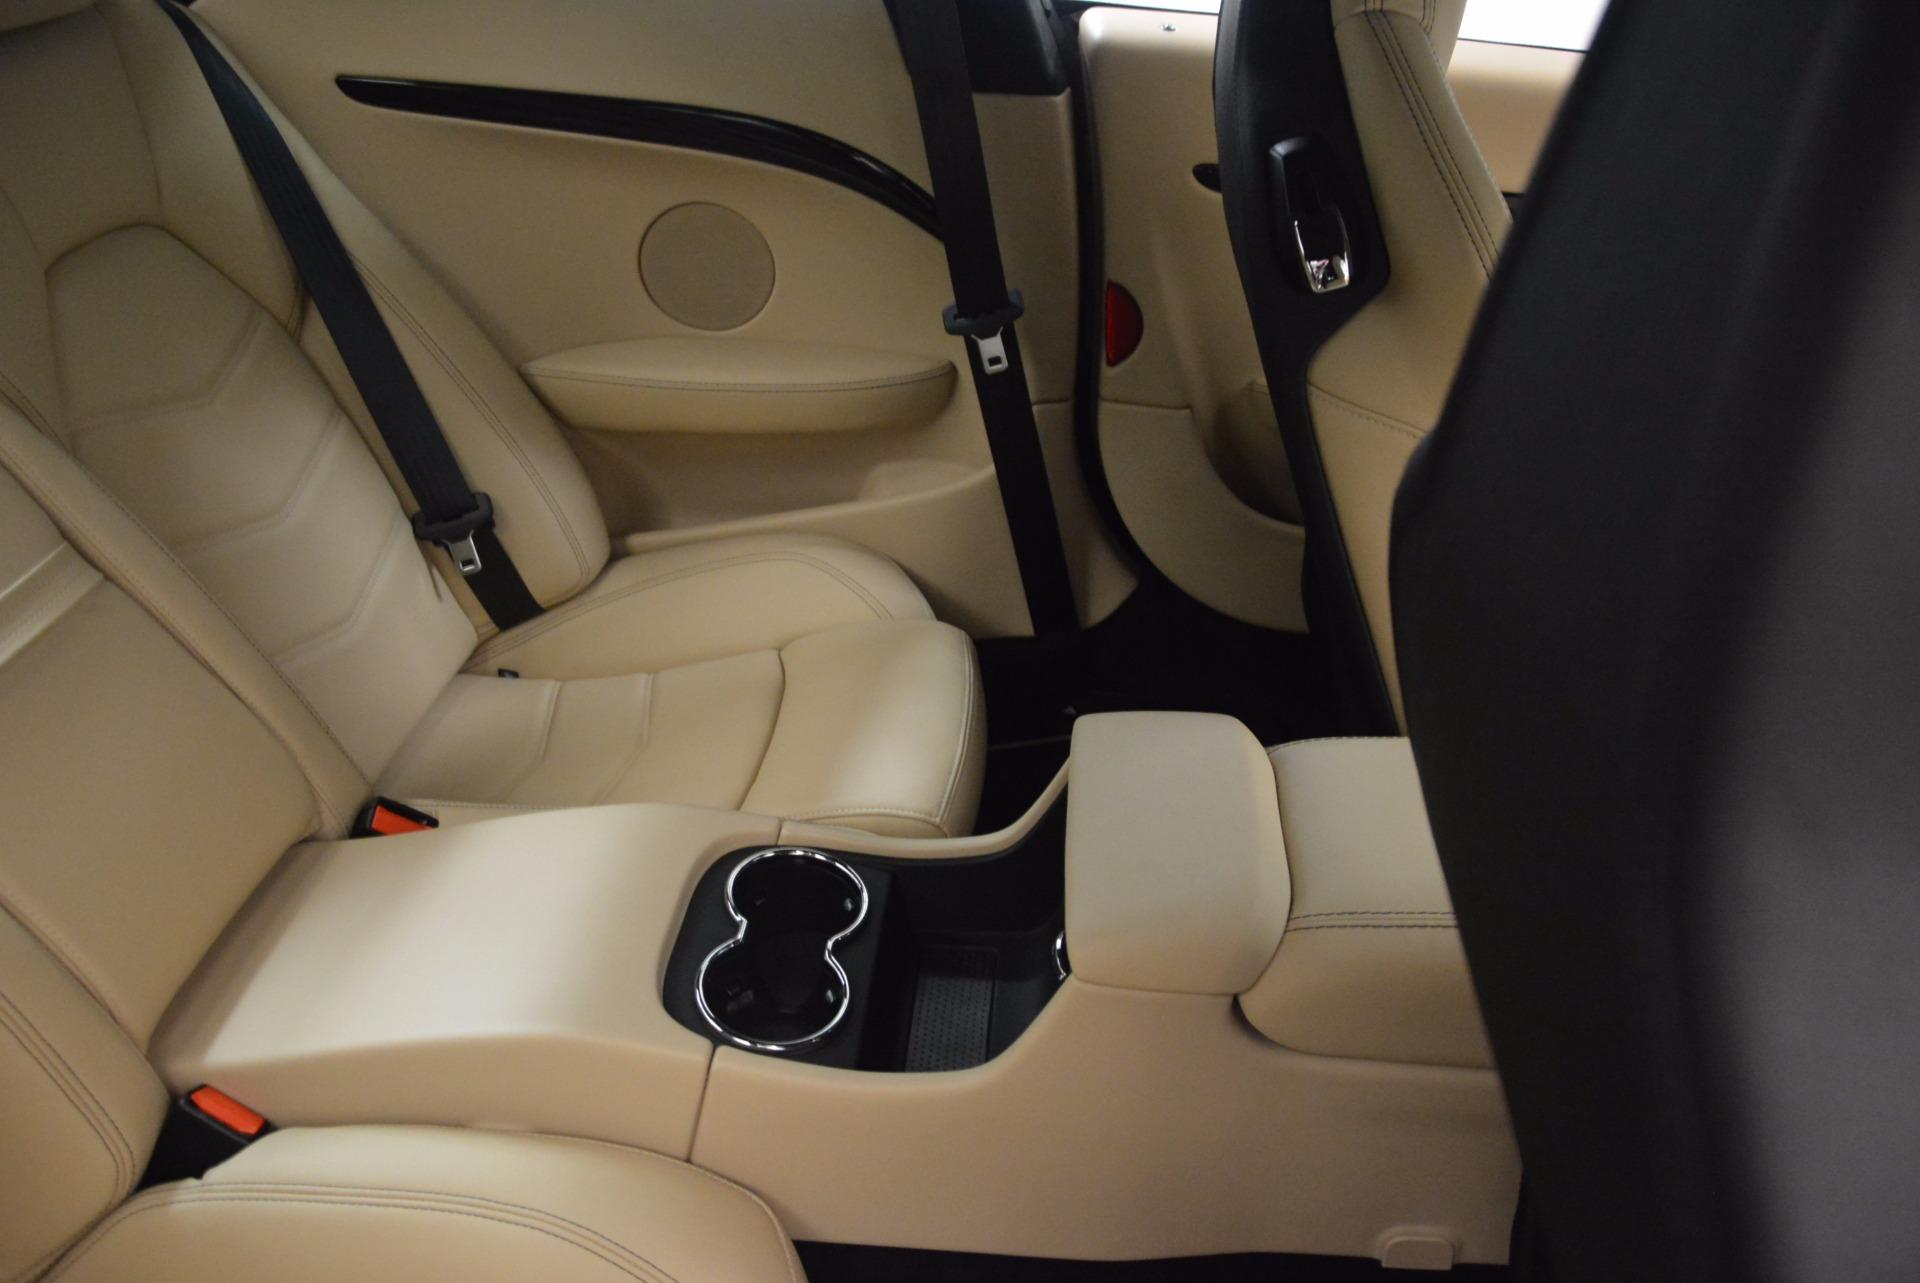 Used 2015 Maserati GranTurismo Sport Coupe For Sale In Westport, CT 1557_p26